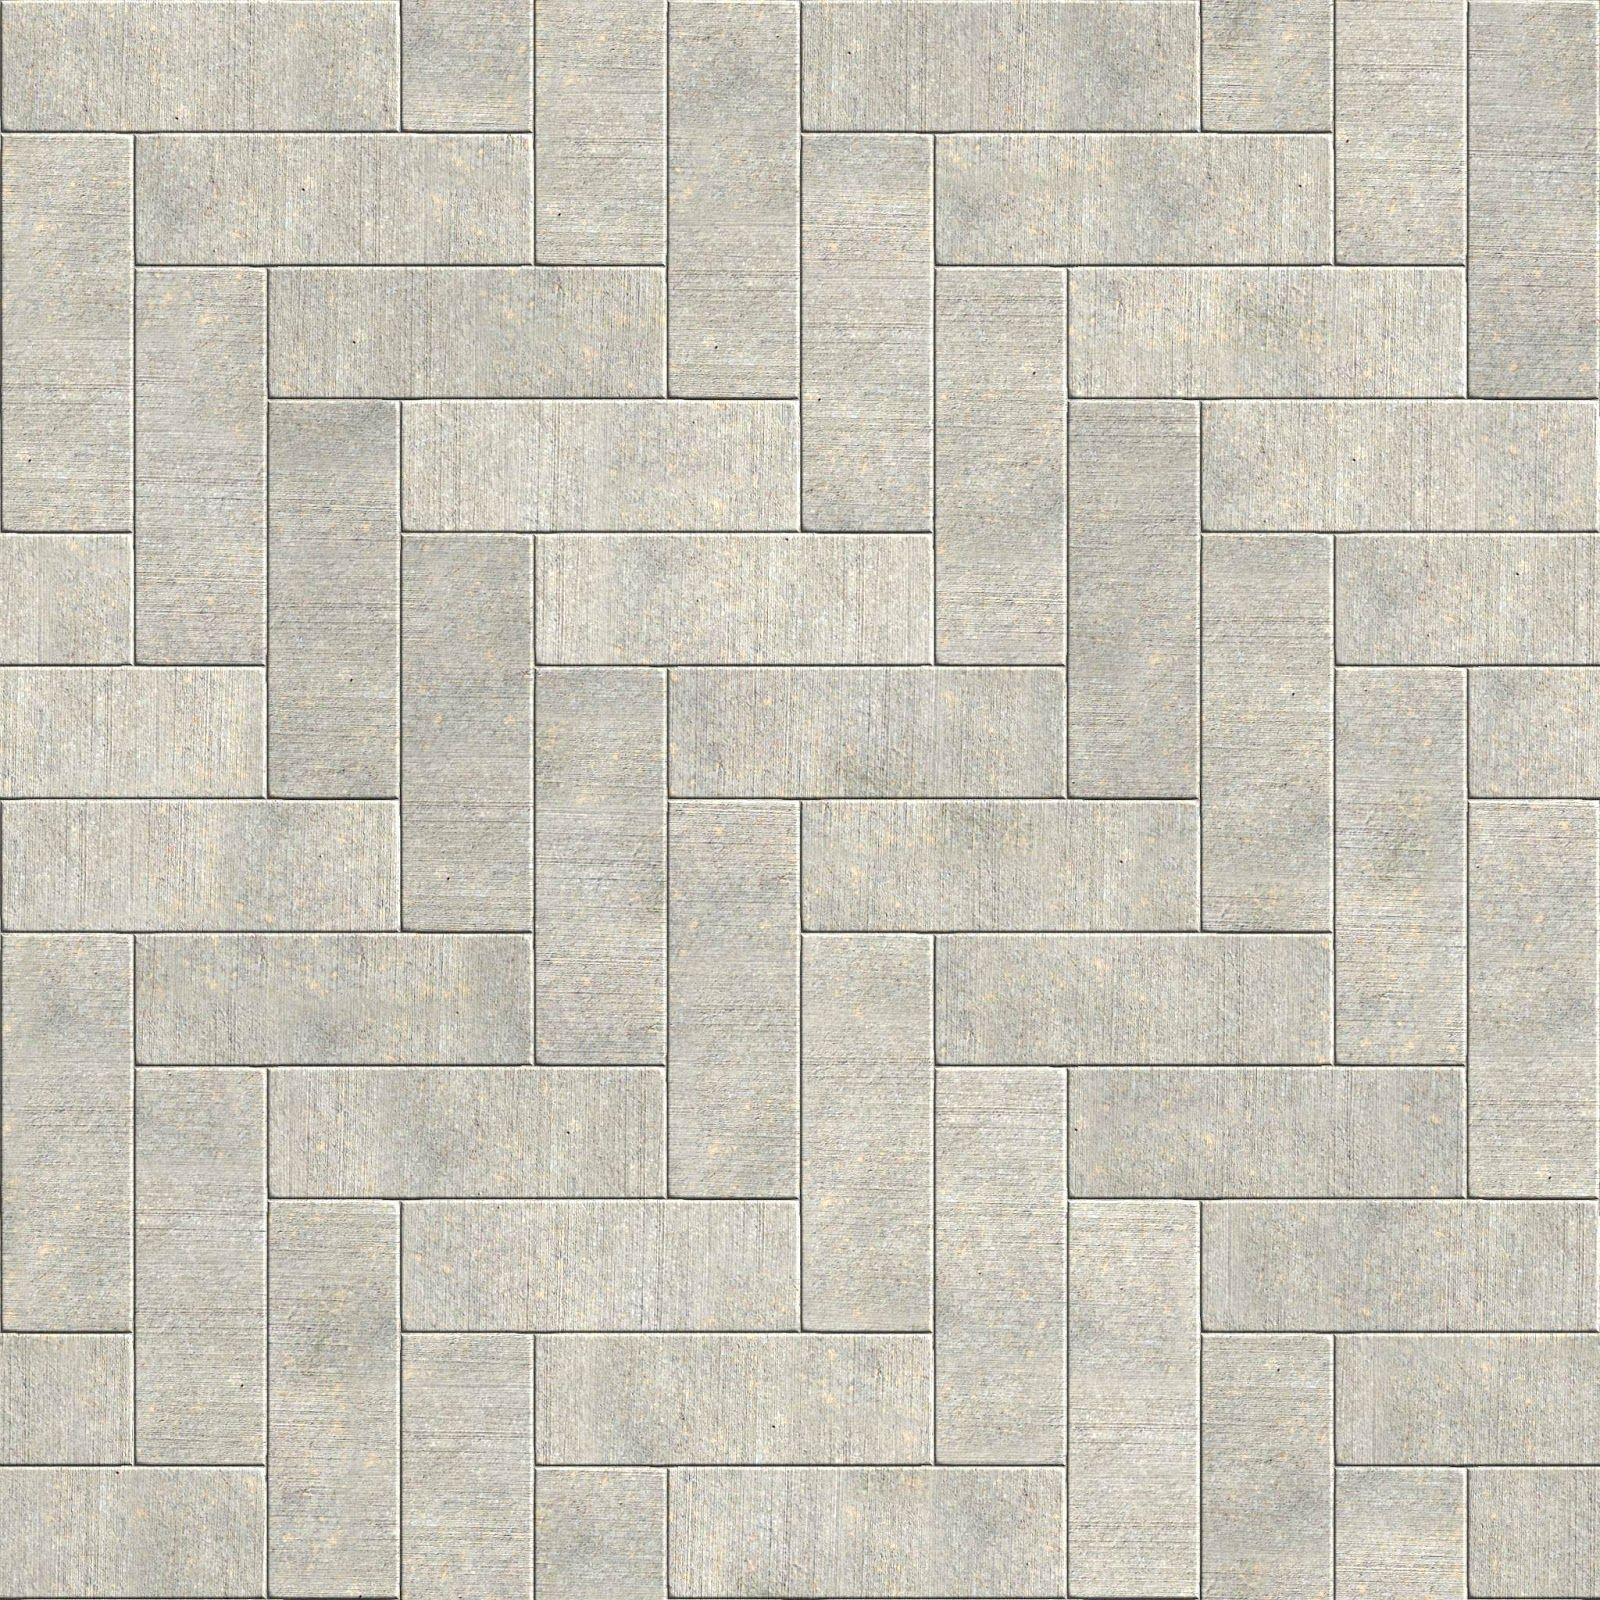 Seamless concrete tiles maps texturise textures for Floor tile planner